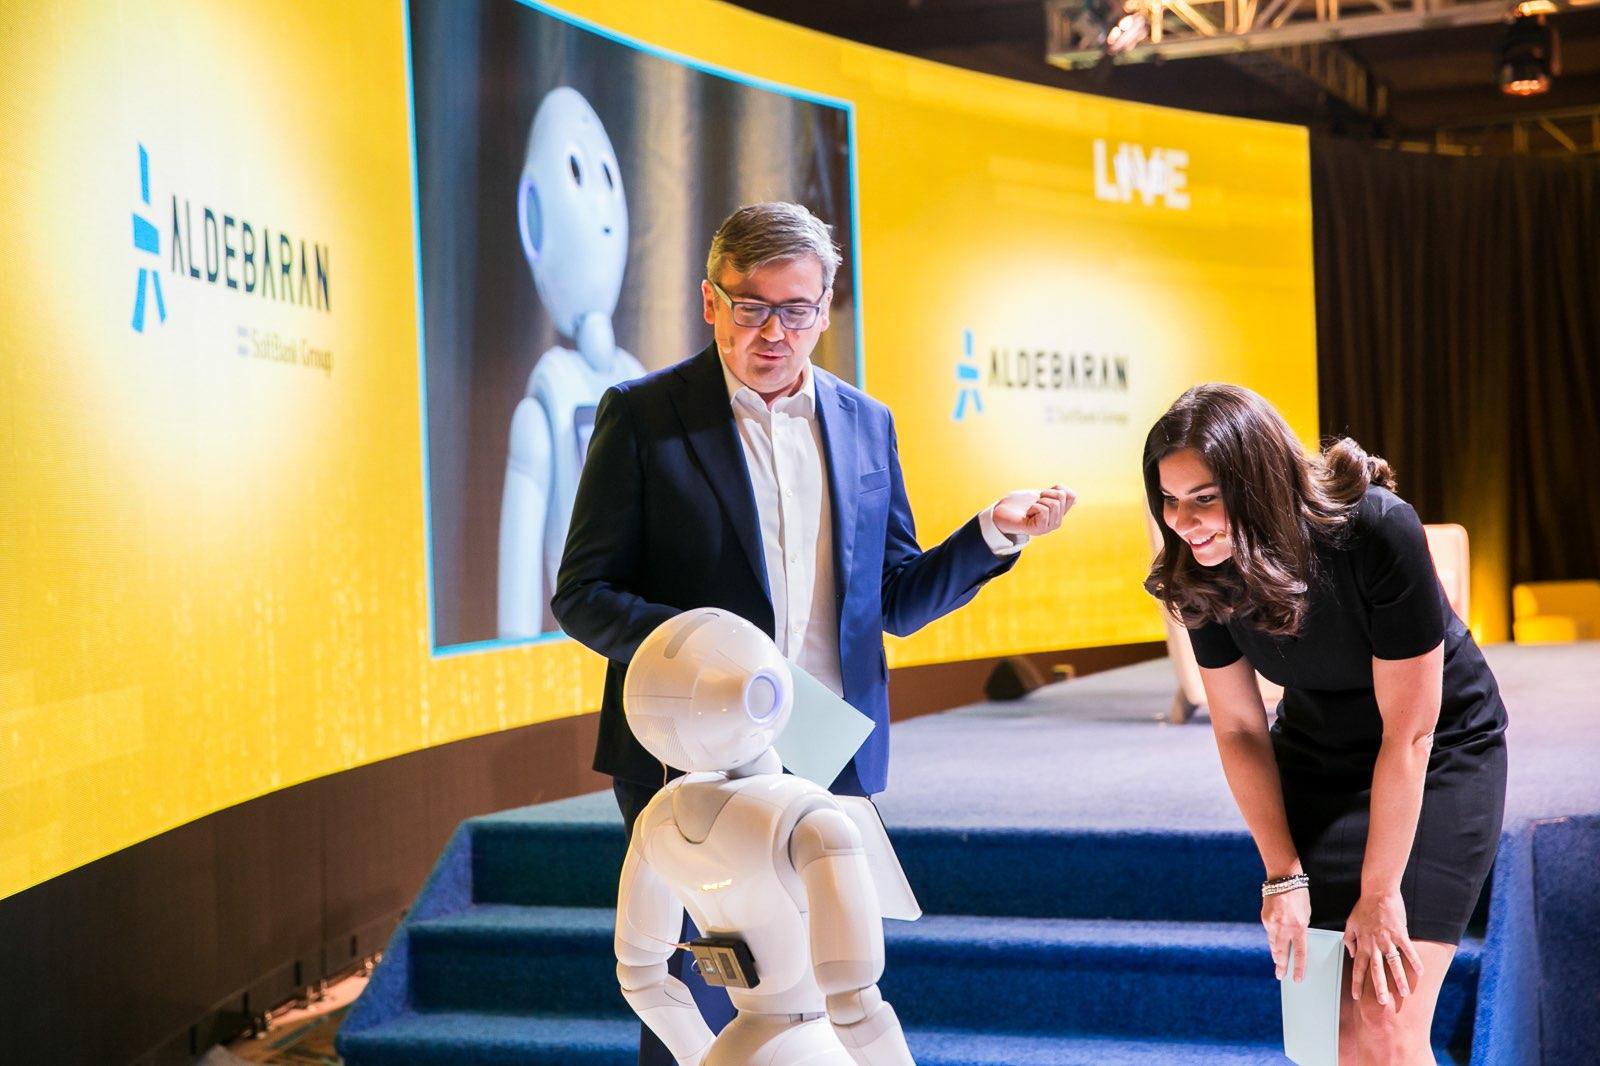 joanna-stern-robots-wsj-tech-live